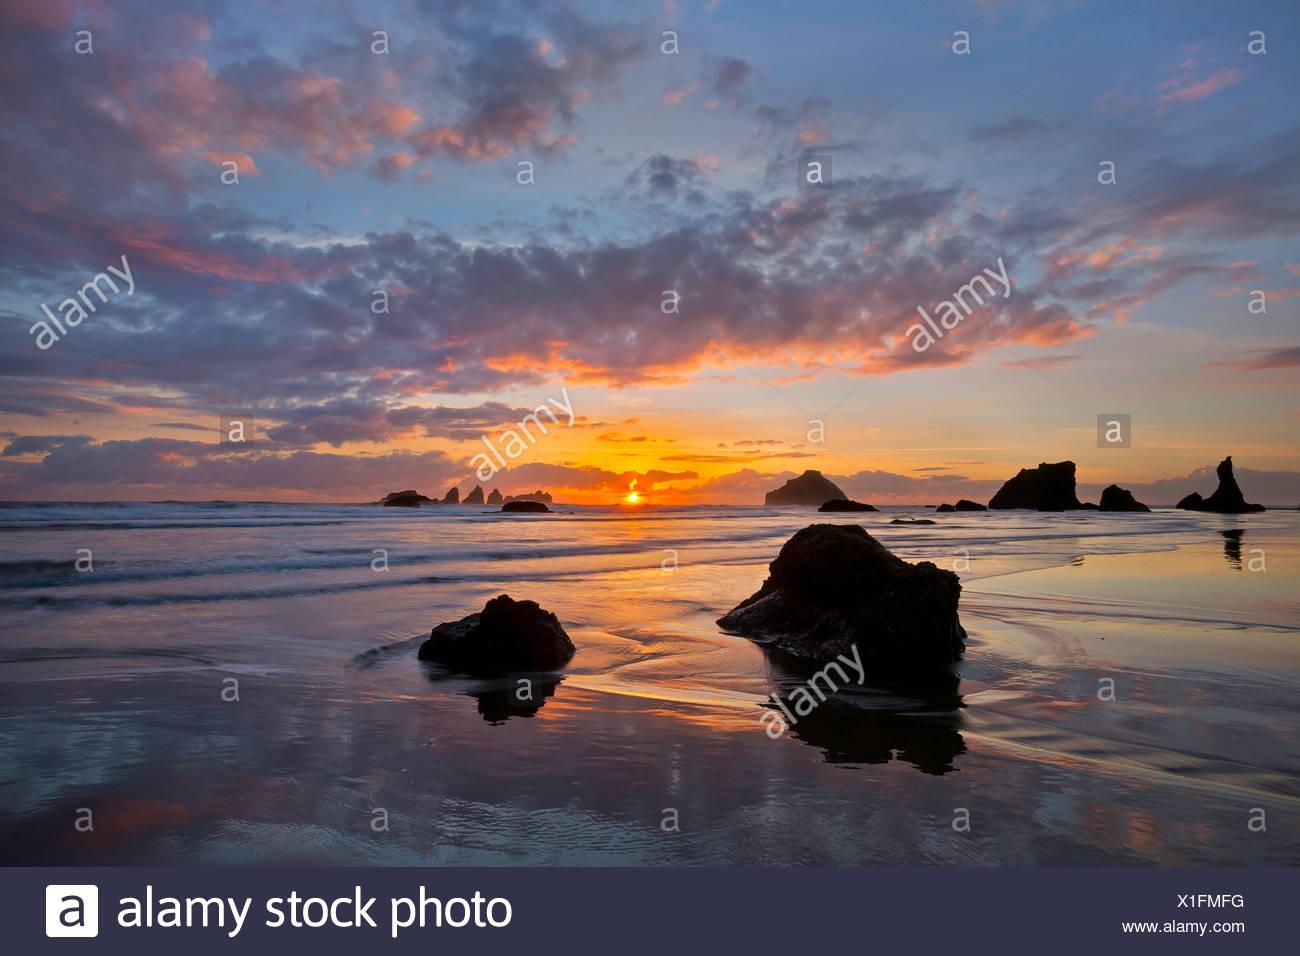 Tidepools and sea stacks, rocks, at sunset along Bandon Beach, Oregon. Winter. USA - Stock Image